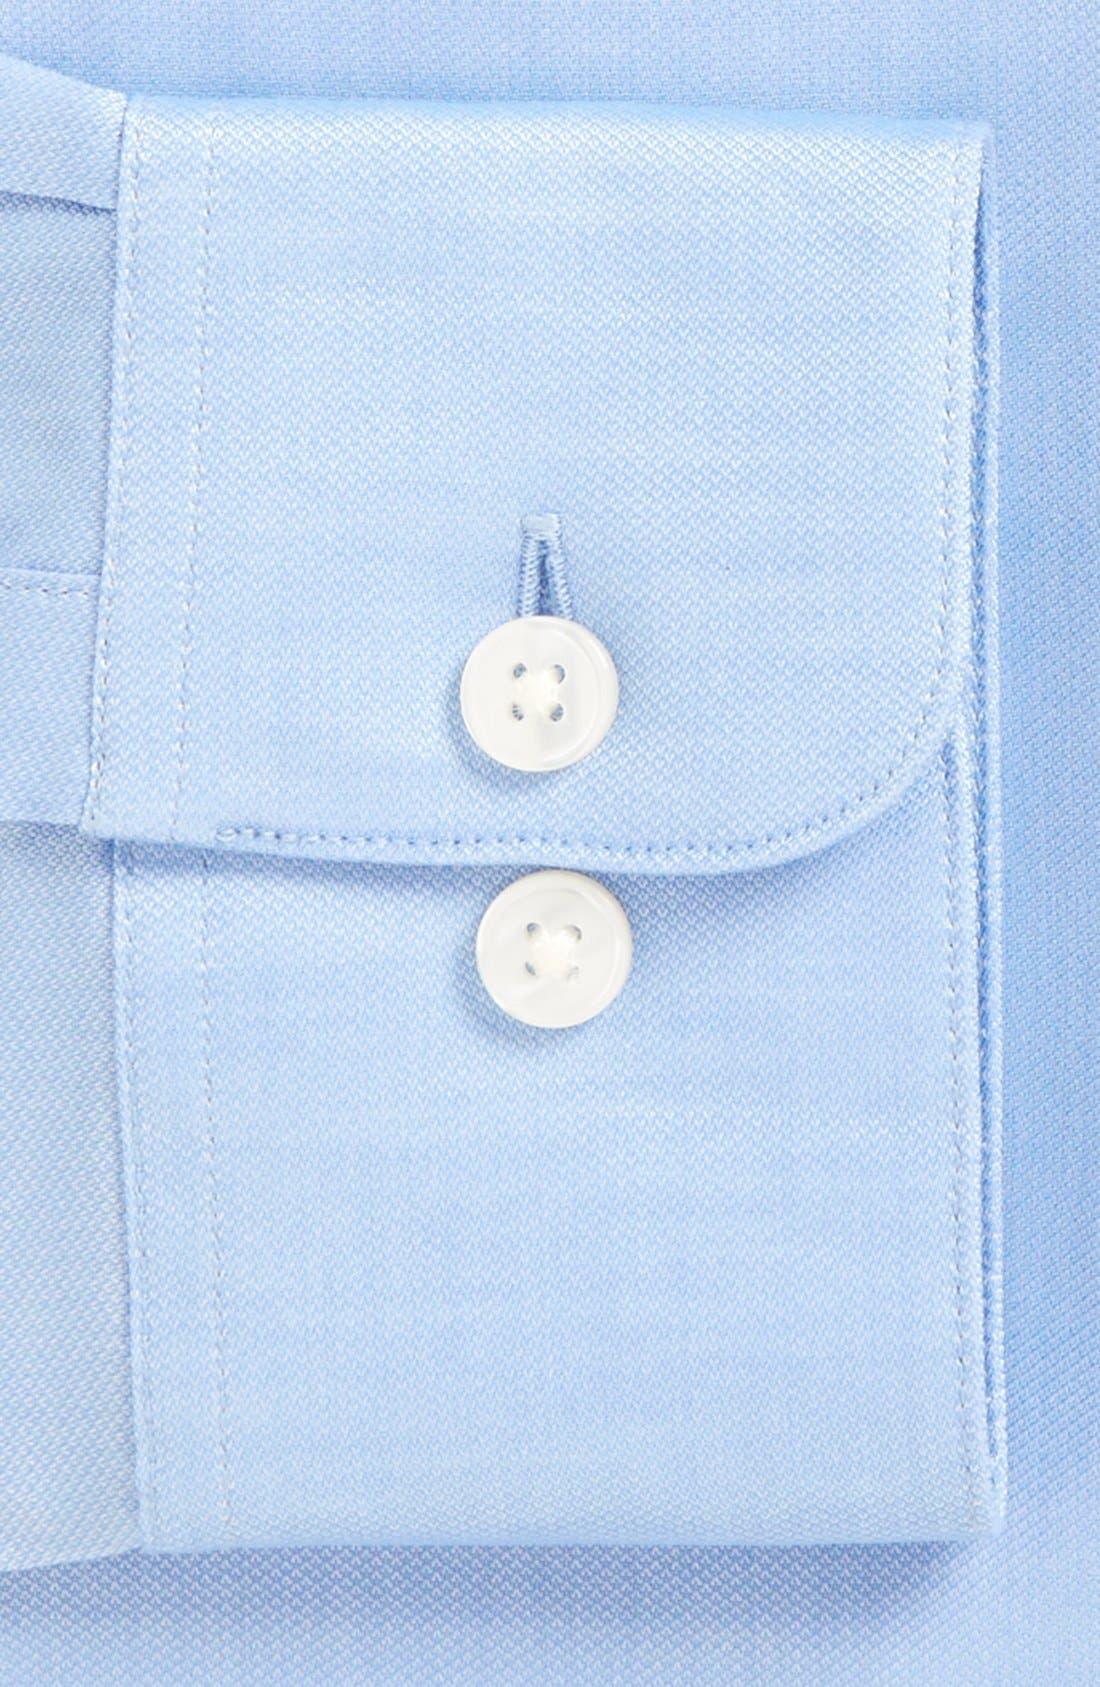 Soho Slim Fit Stretch Solid Dress Shirt,                             Alternate thumbnail 3, color,                             ATLANTIC BLUE